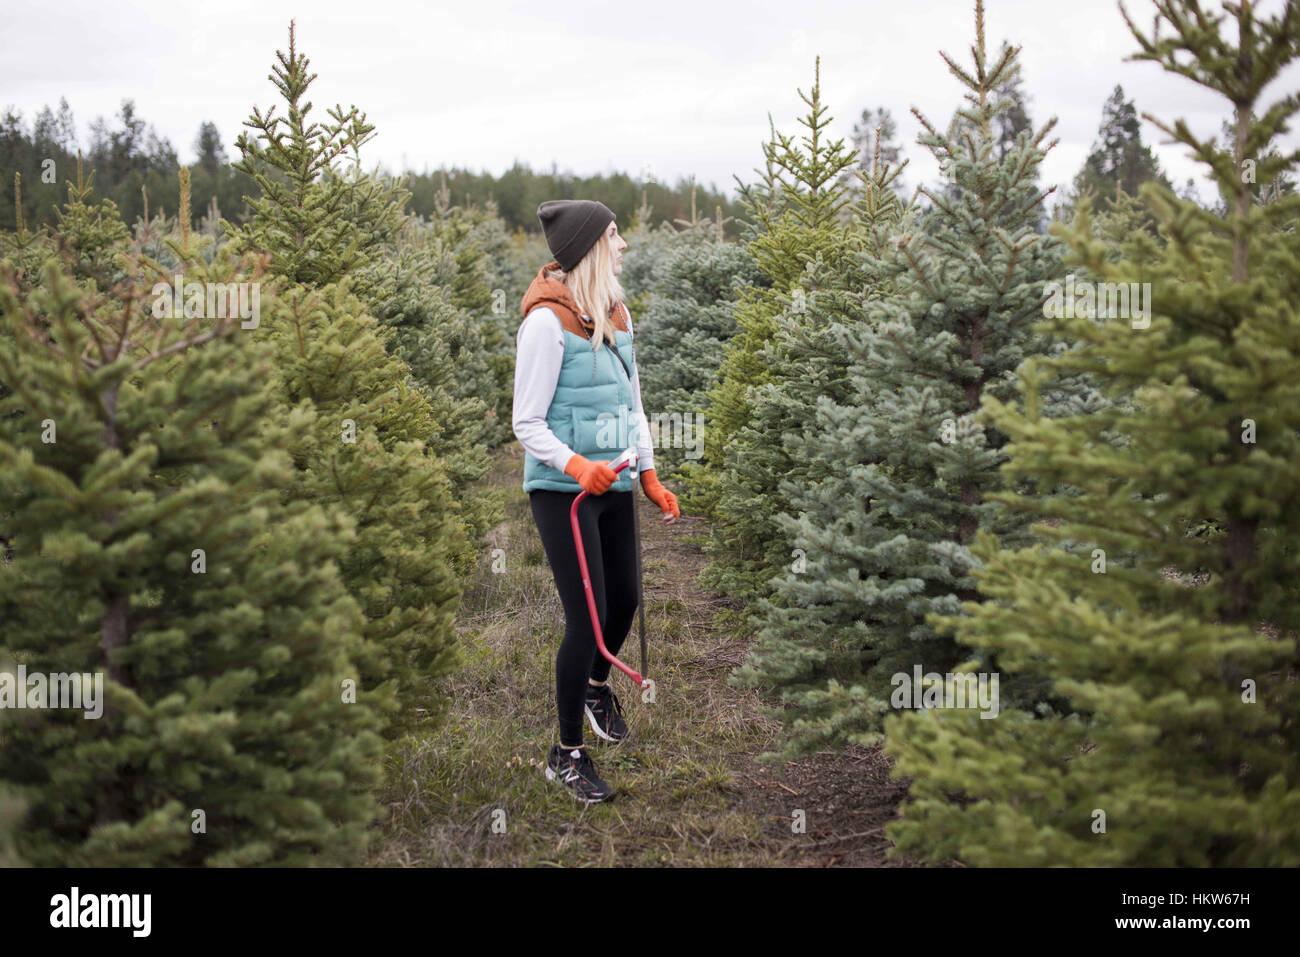 Newman Christmas Trees.Spokane Washington Usa 25th Nov 2016 Courtney Conklin